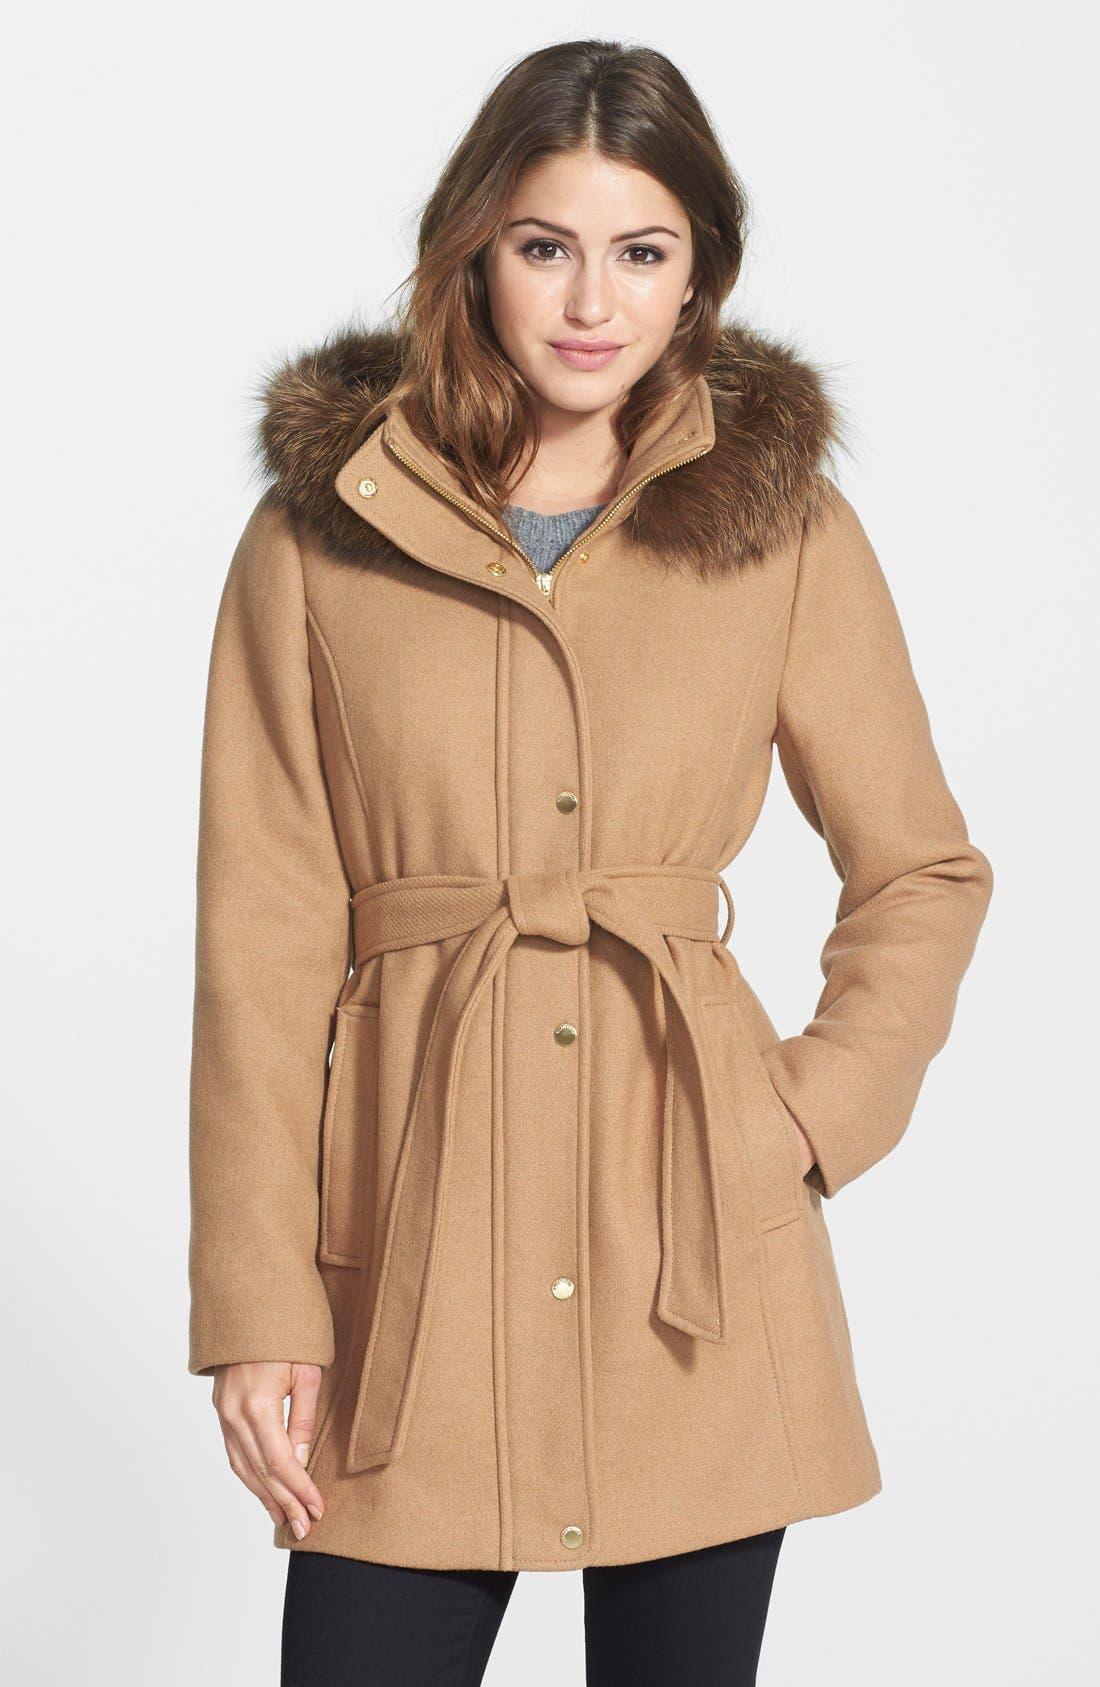 Alternate Image 1 Selected - Ellen Tracy Hooded Wool Blend Coat with Genuine Fox Fur Trim (Online Only)